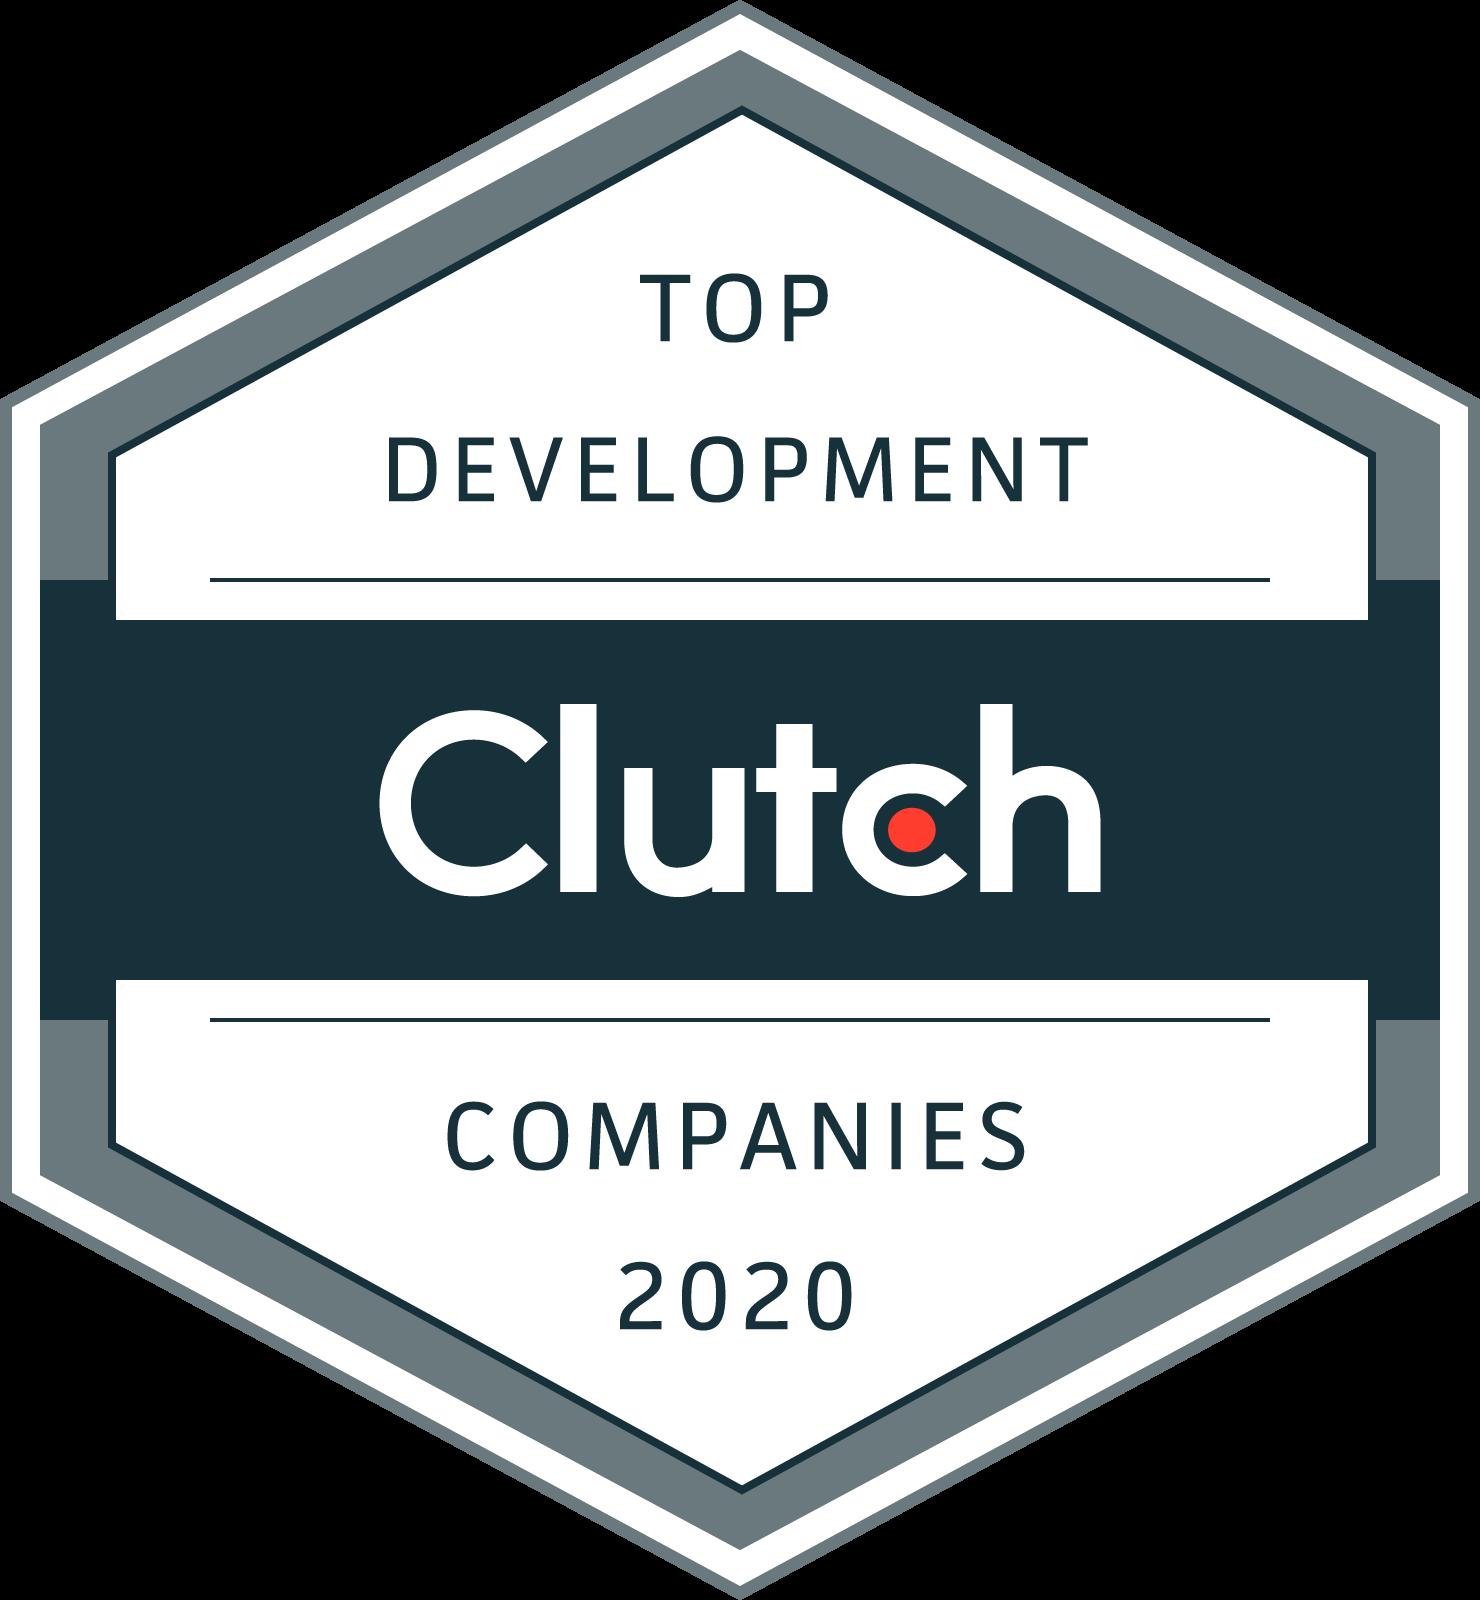 Clutch - Top Development Companies 2020